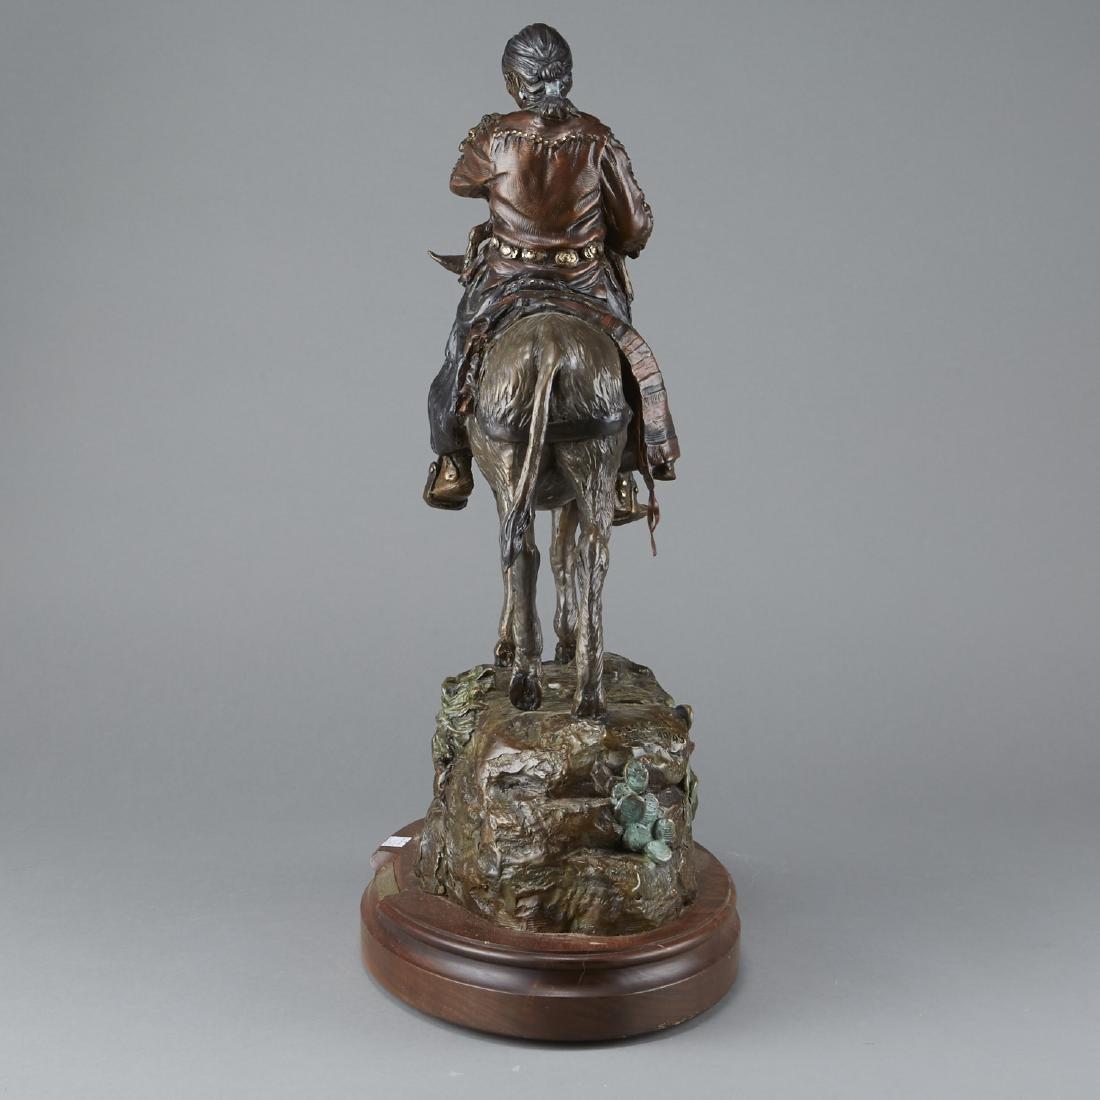 Susan Kliewer Bronze of Woman on Horseback - 2